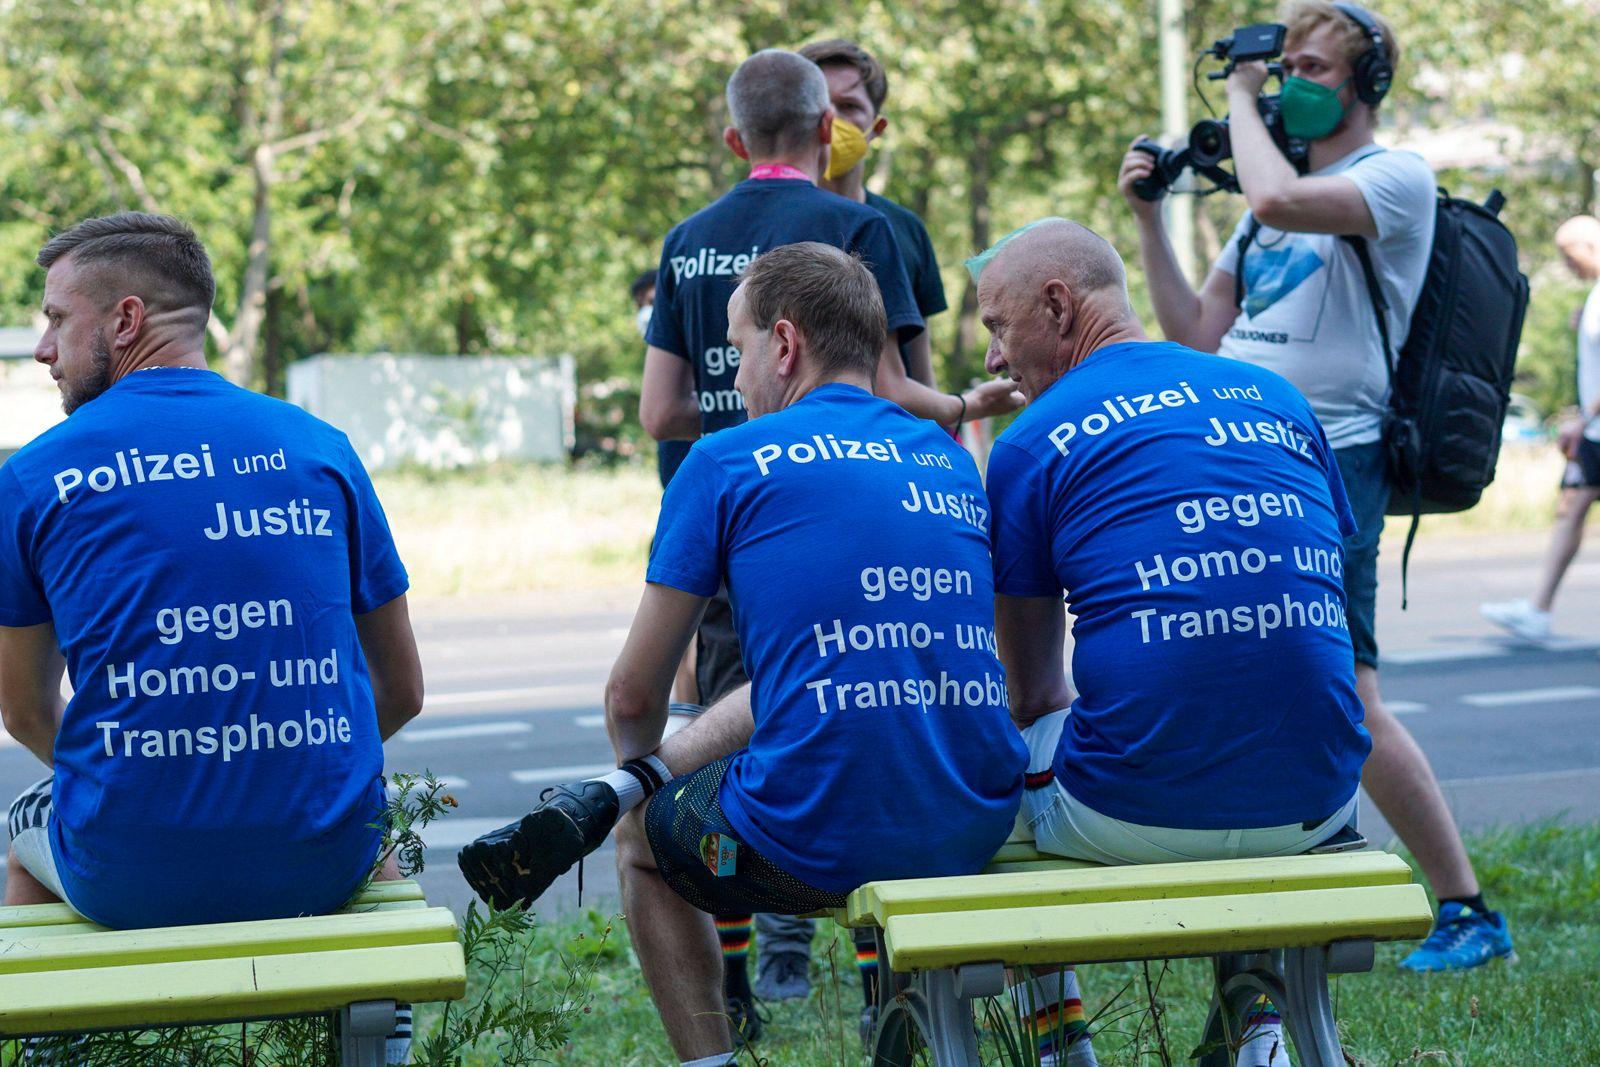 Berlin, Deutschland 24. Juli 2021: Polizei und Justiz gegen Homophobie Berlin *** Berlin, Germany 24 July 2021 Police a